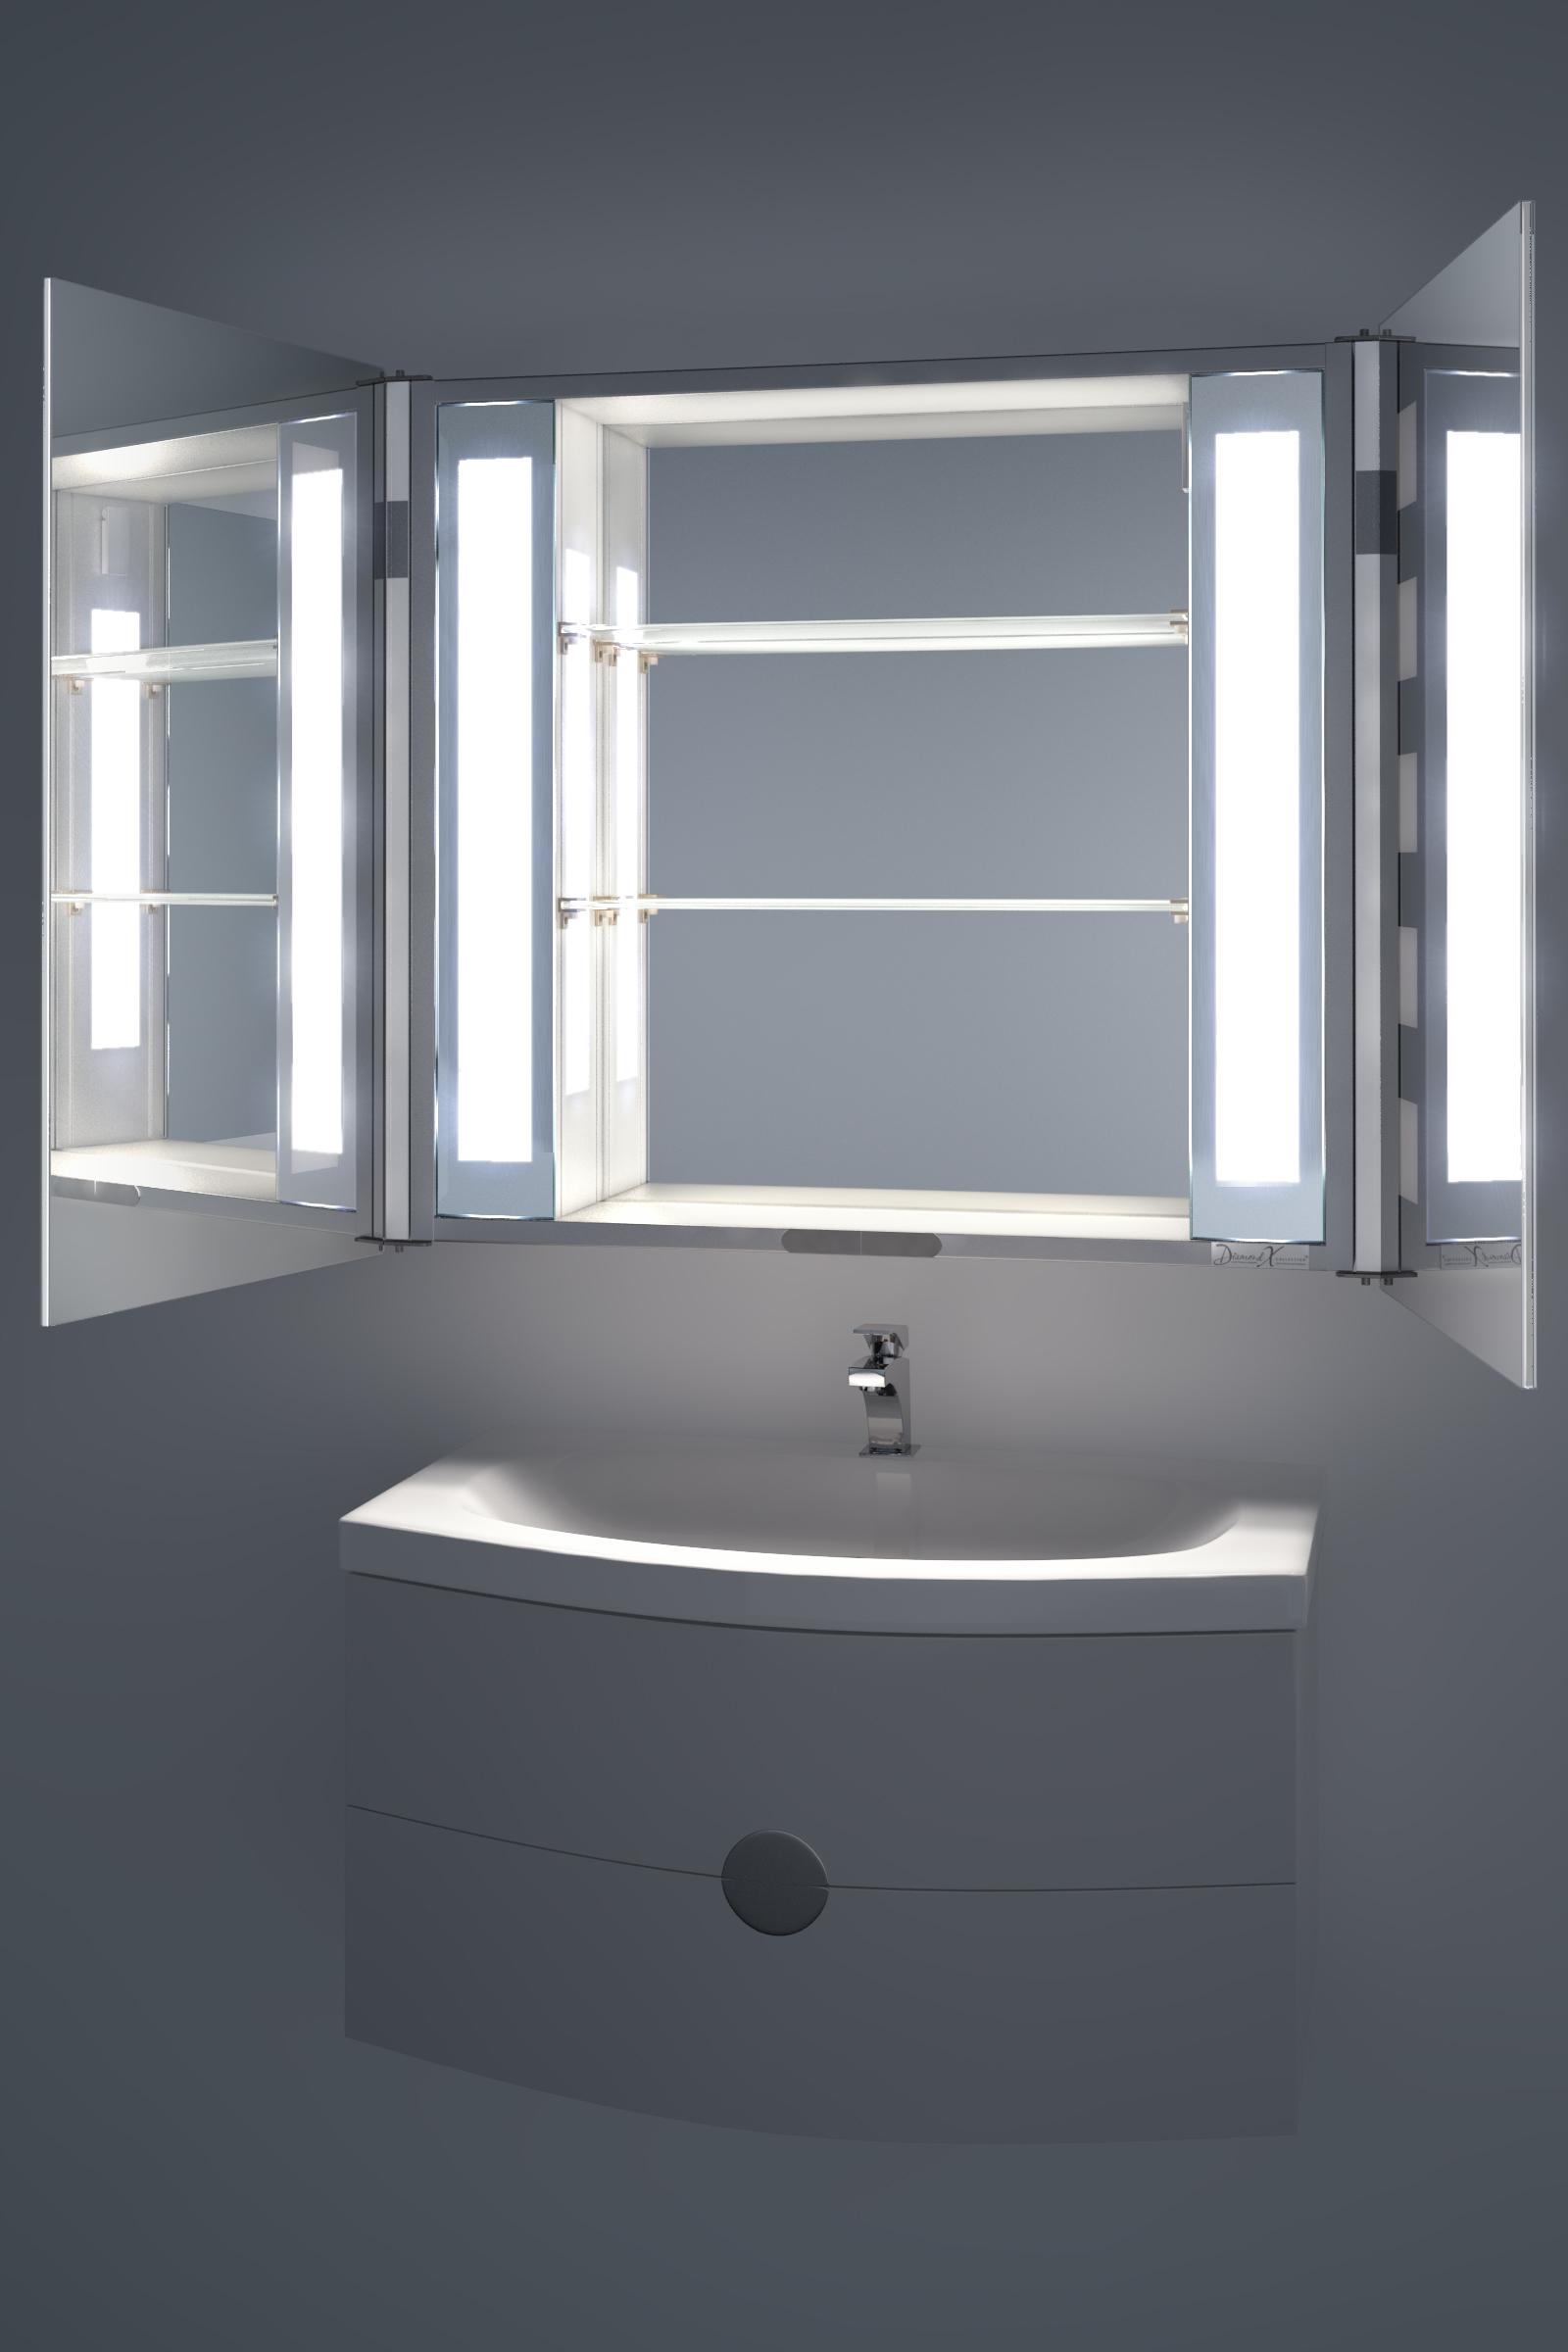 Cheap Illuminated Bathroom Mirrors: Excel LED Illuminated Bathroom Mirror Cabinet With Sensor